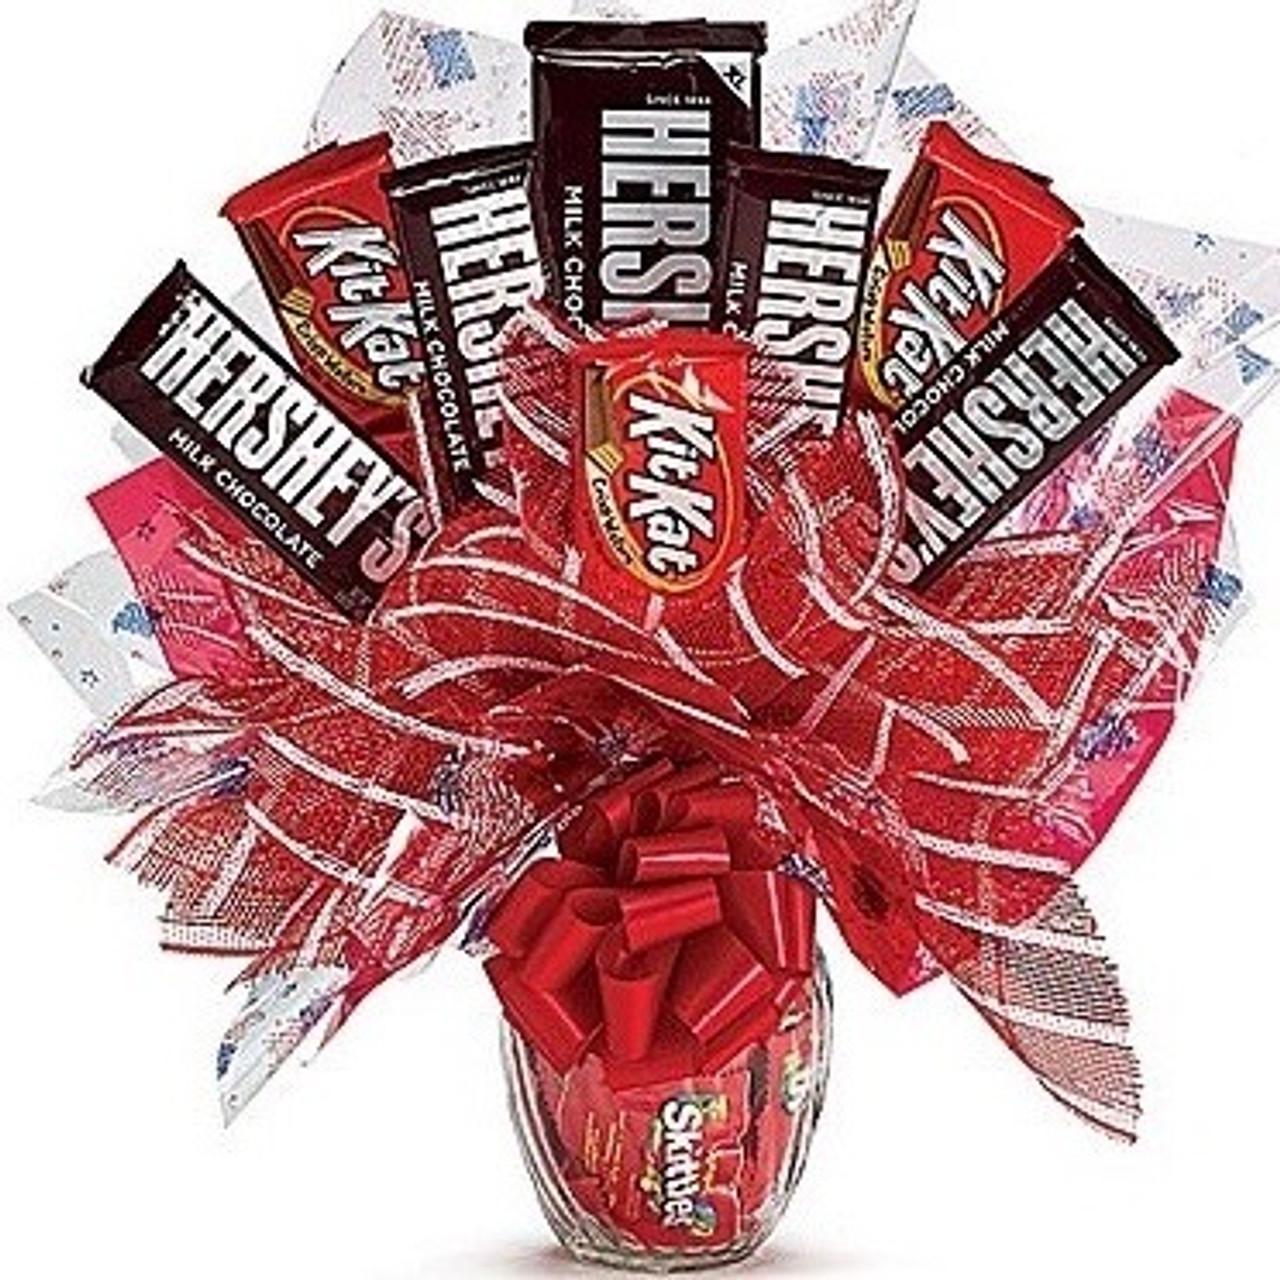 Hershey's & Kit Kat Candy Bouquet